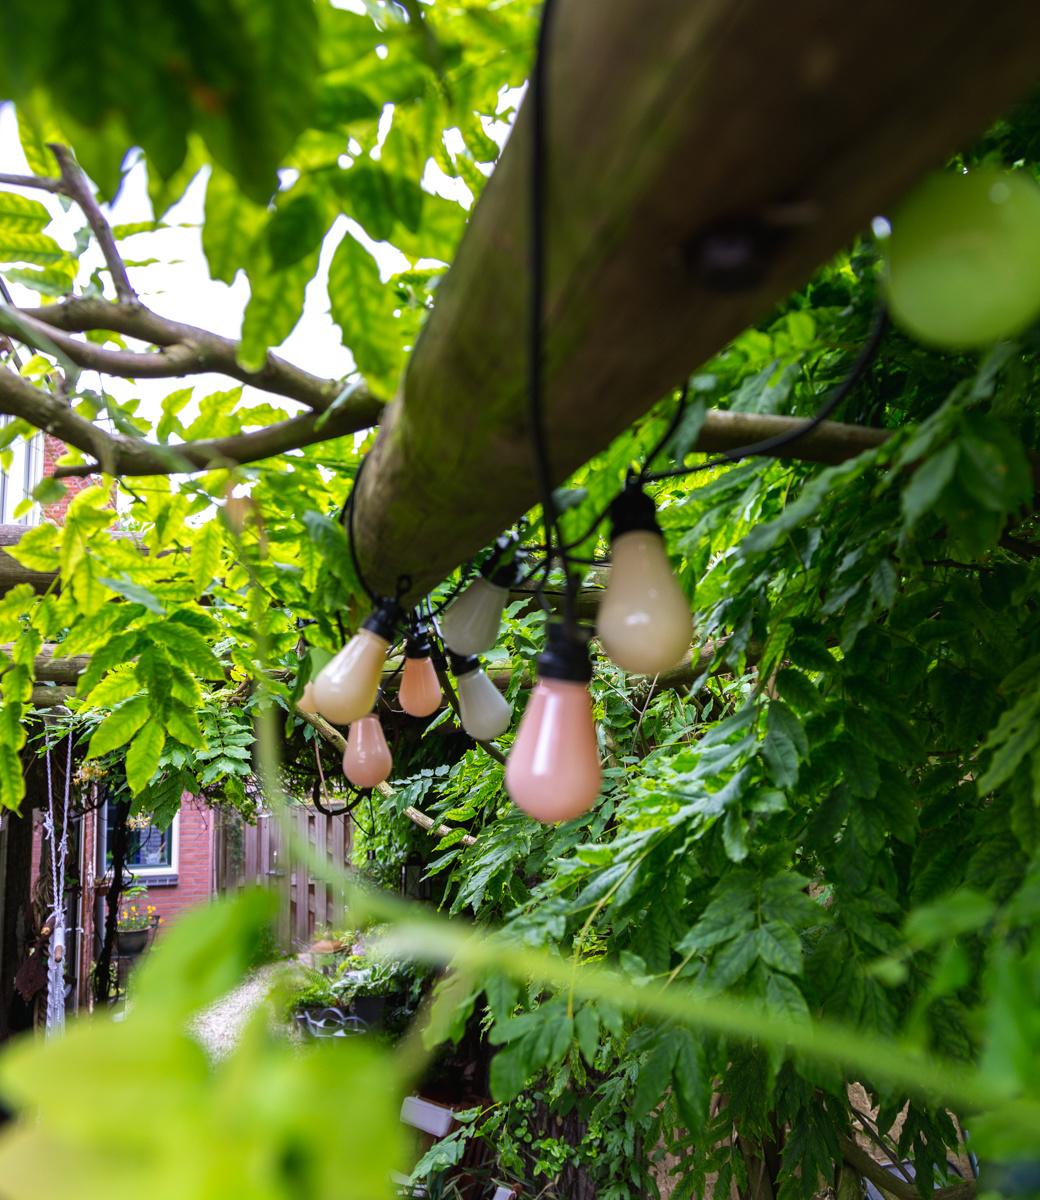 LEDR buiten feestverlichting groen en roze - Outdoor Patio Lichtslinger Paradise - 10 LED lampen - Edison Bulbs-4